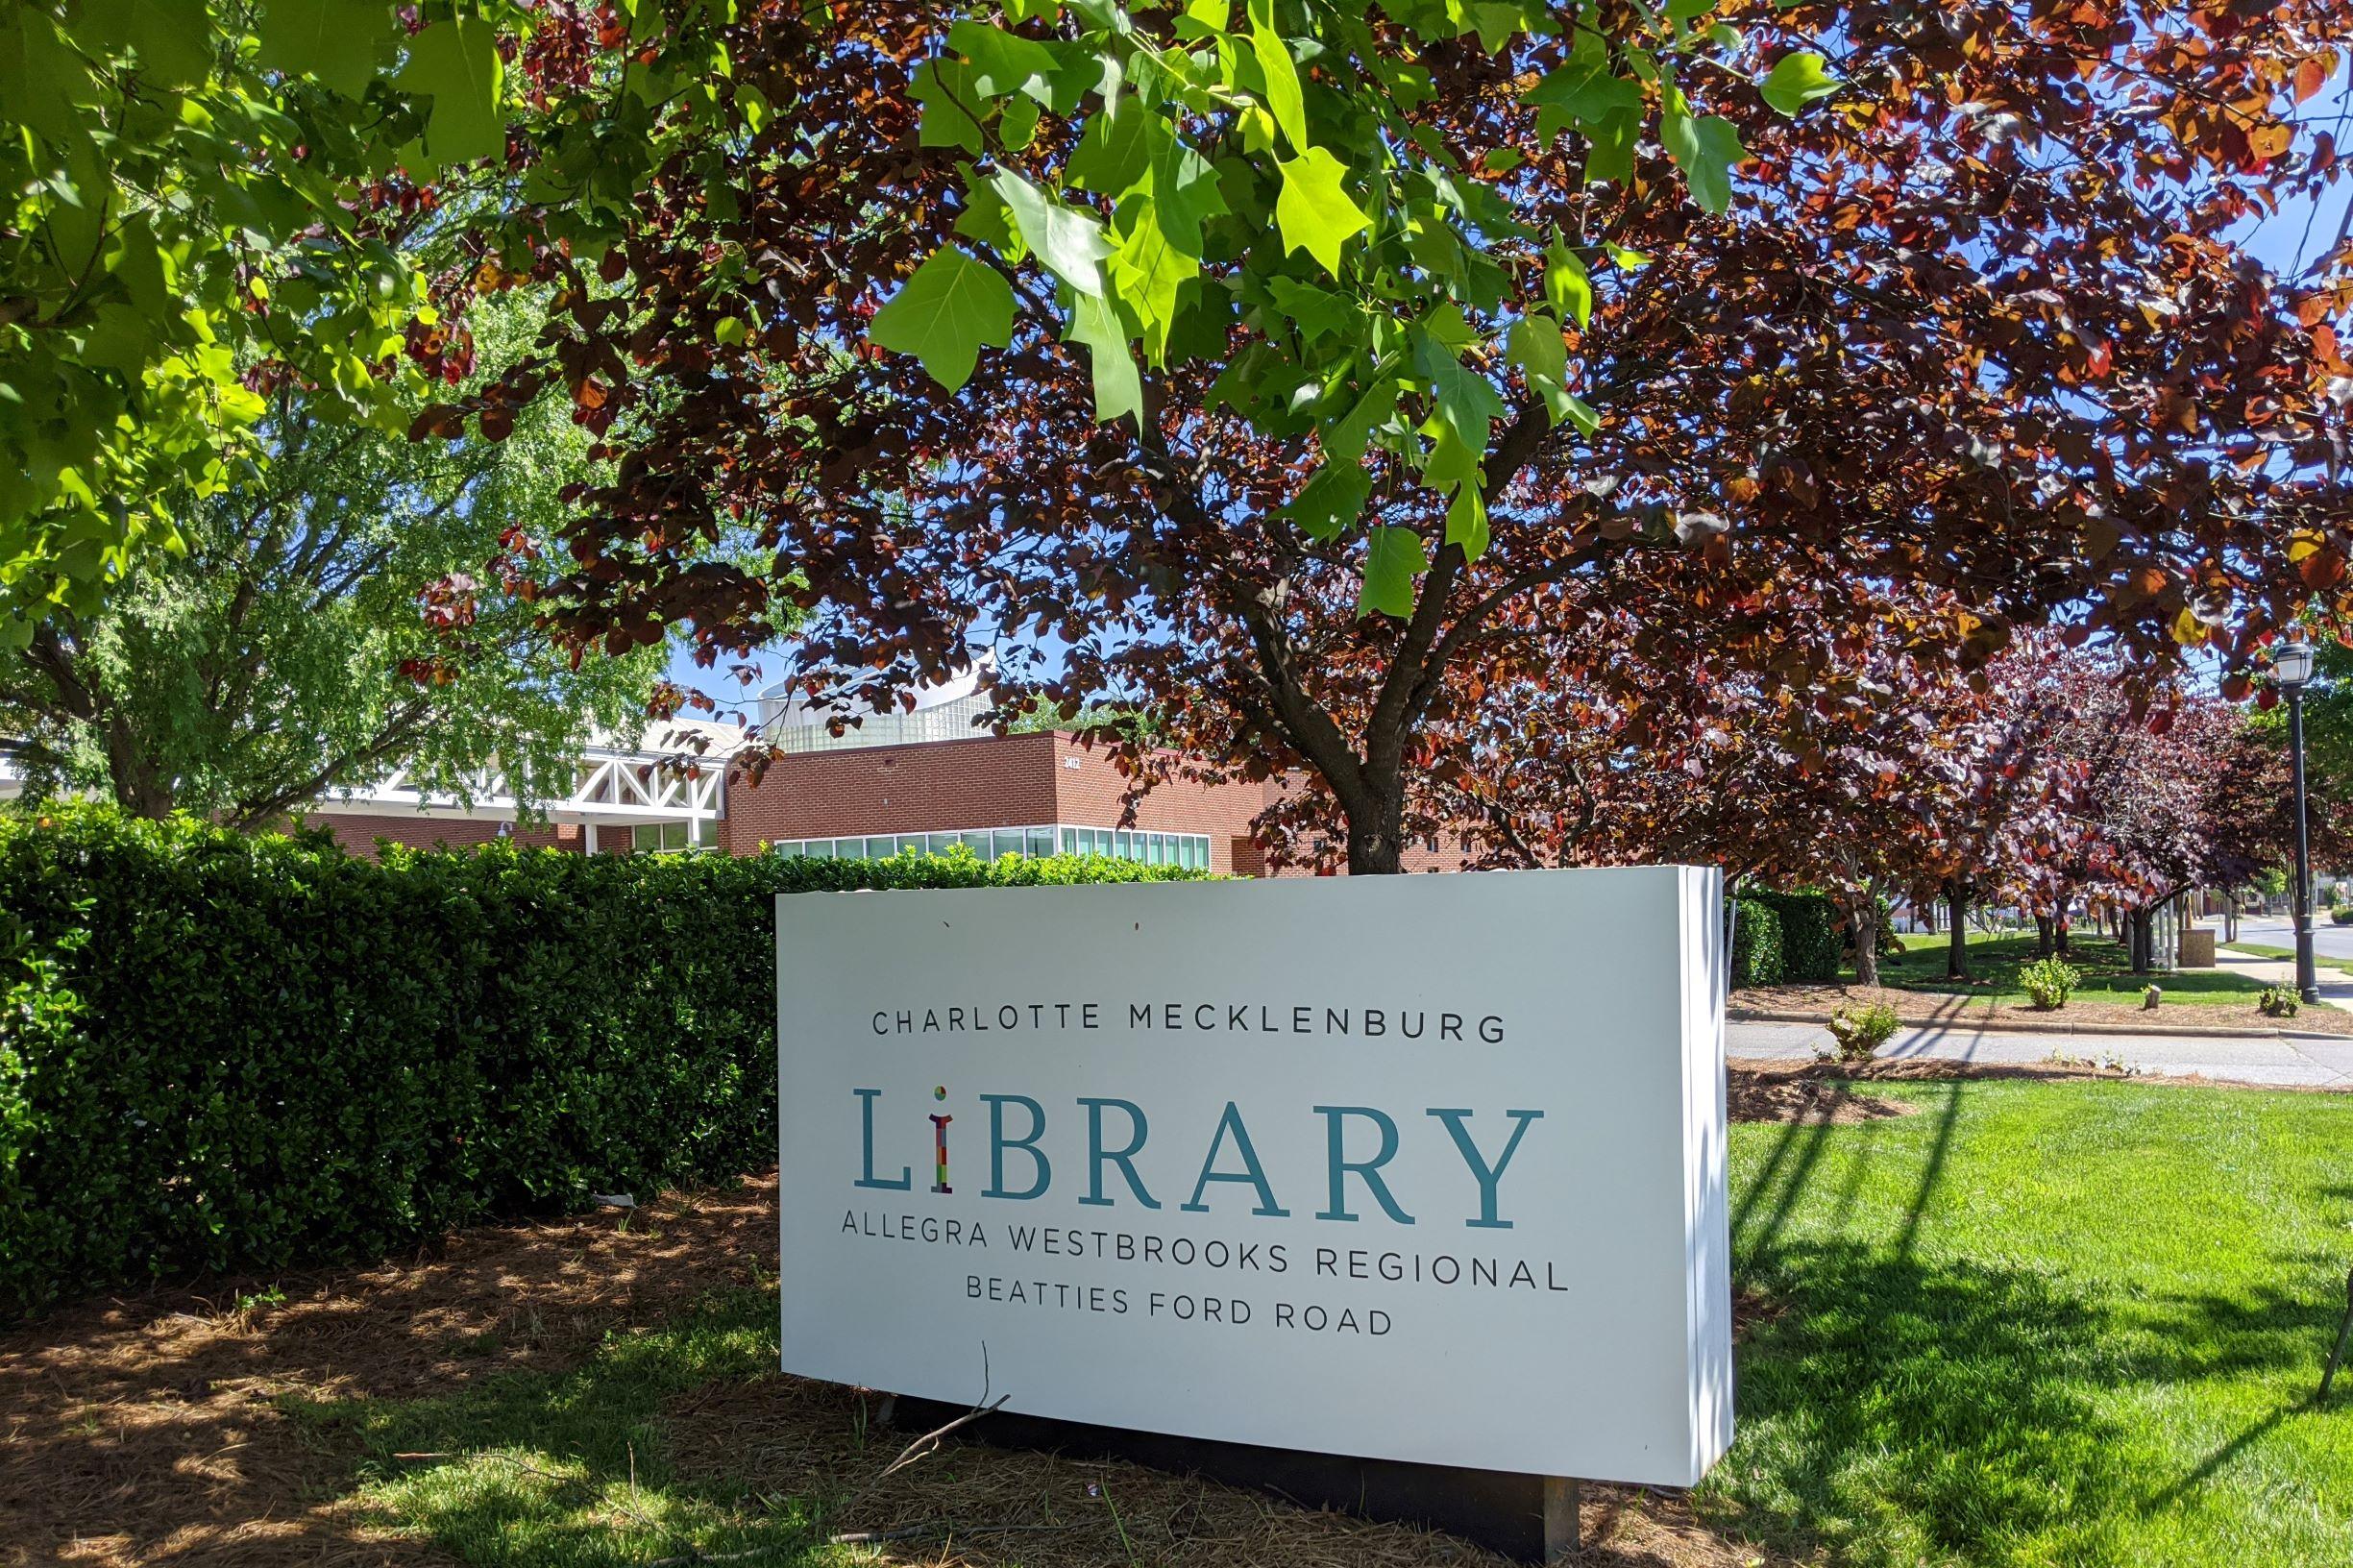 Beatties-Ford-Road-Library-Allegra-Westbrooks